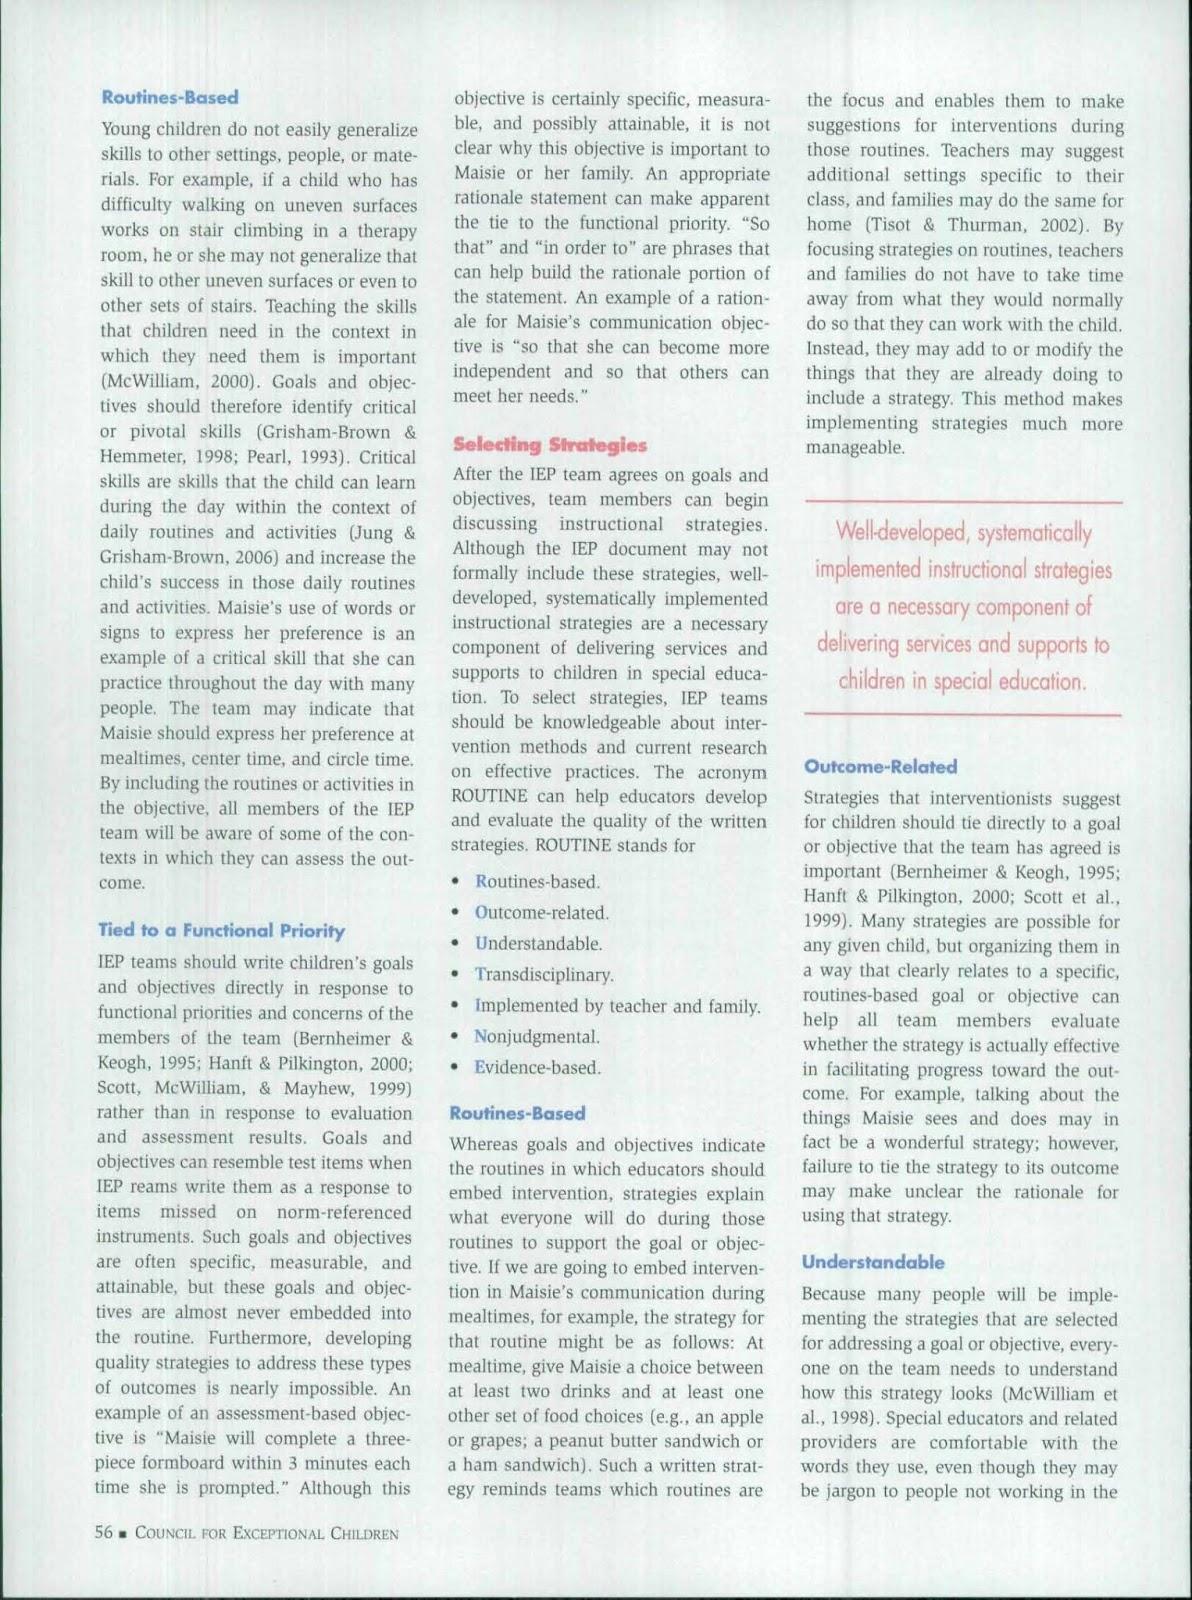 Erika's Ed Tech 6030 Blog: RSA #2: Writing SMART